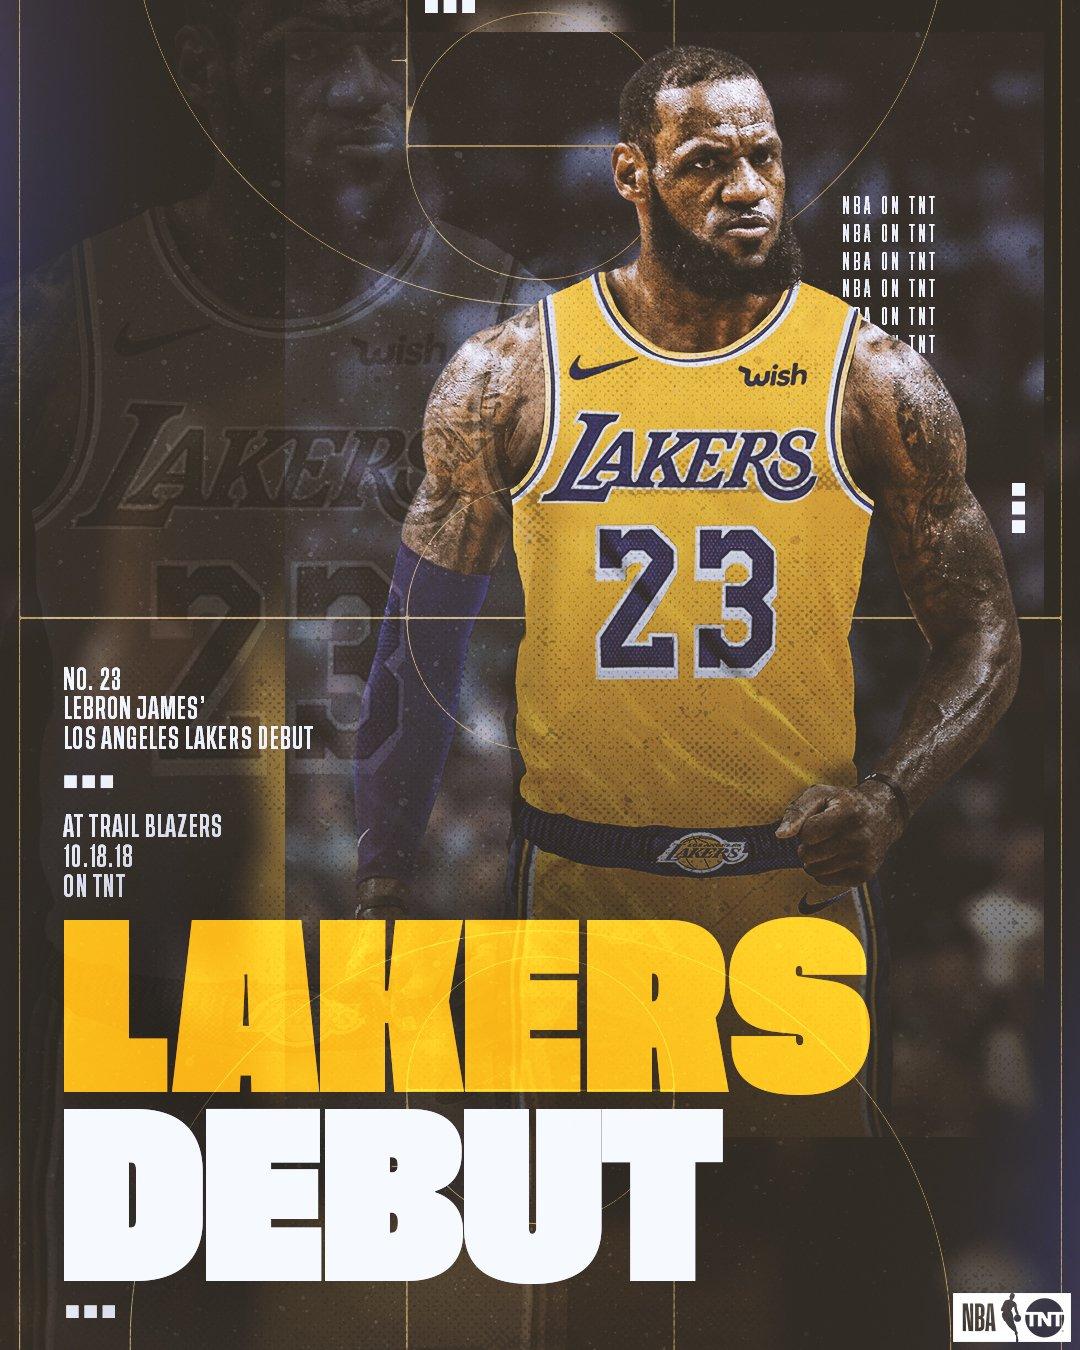 ICYMI: @KingJames will make his @Lakers debut on TNT! ���� https://t.co/wsoizwdwiz